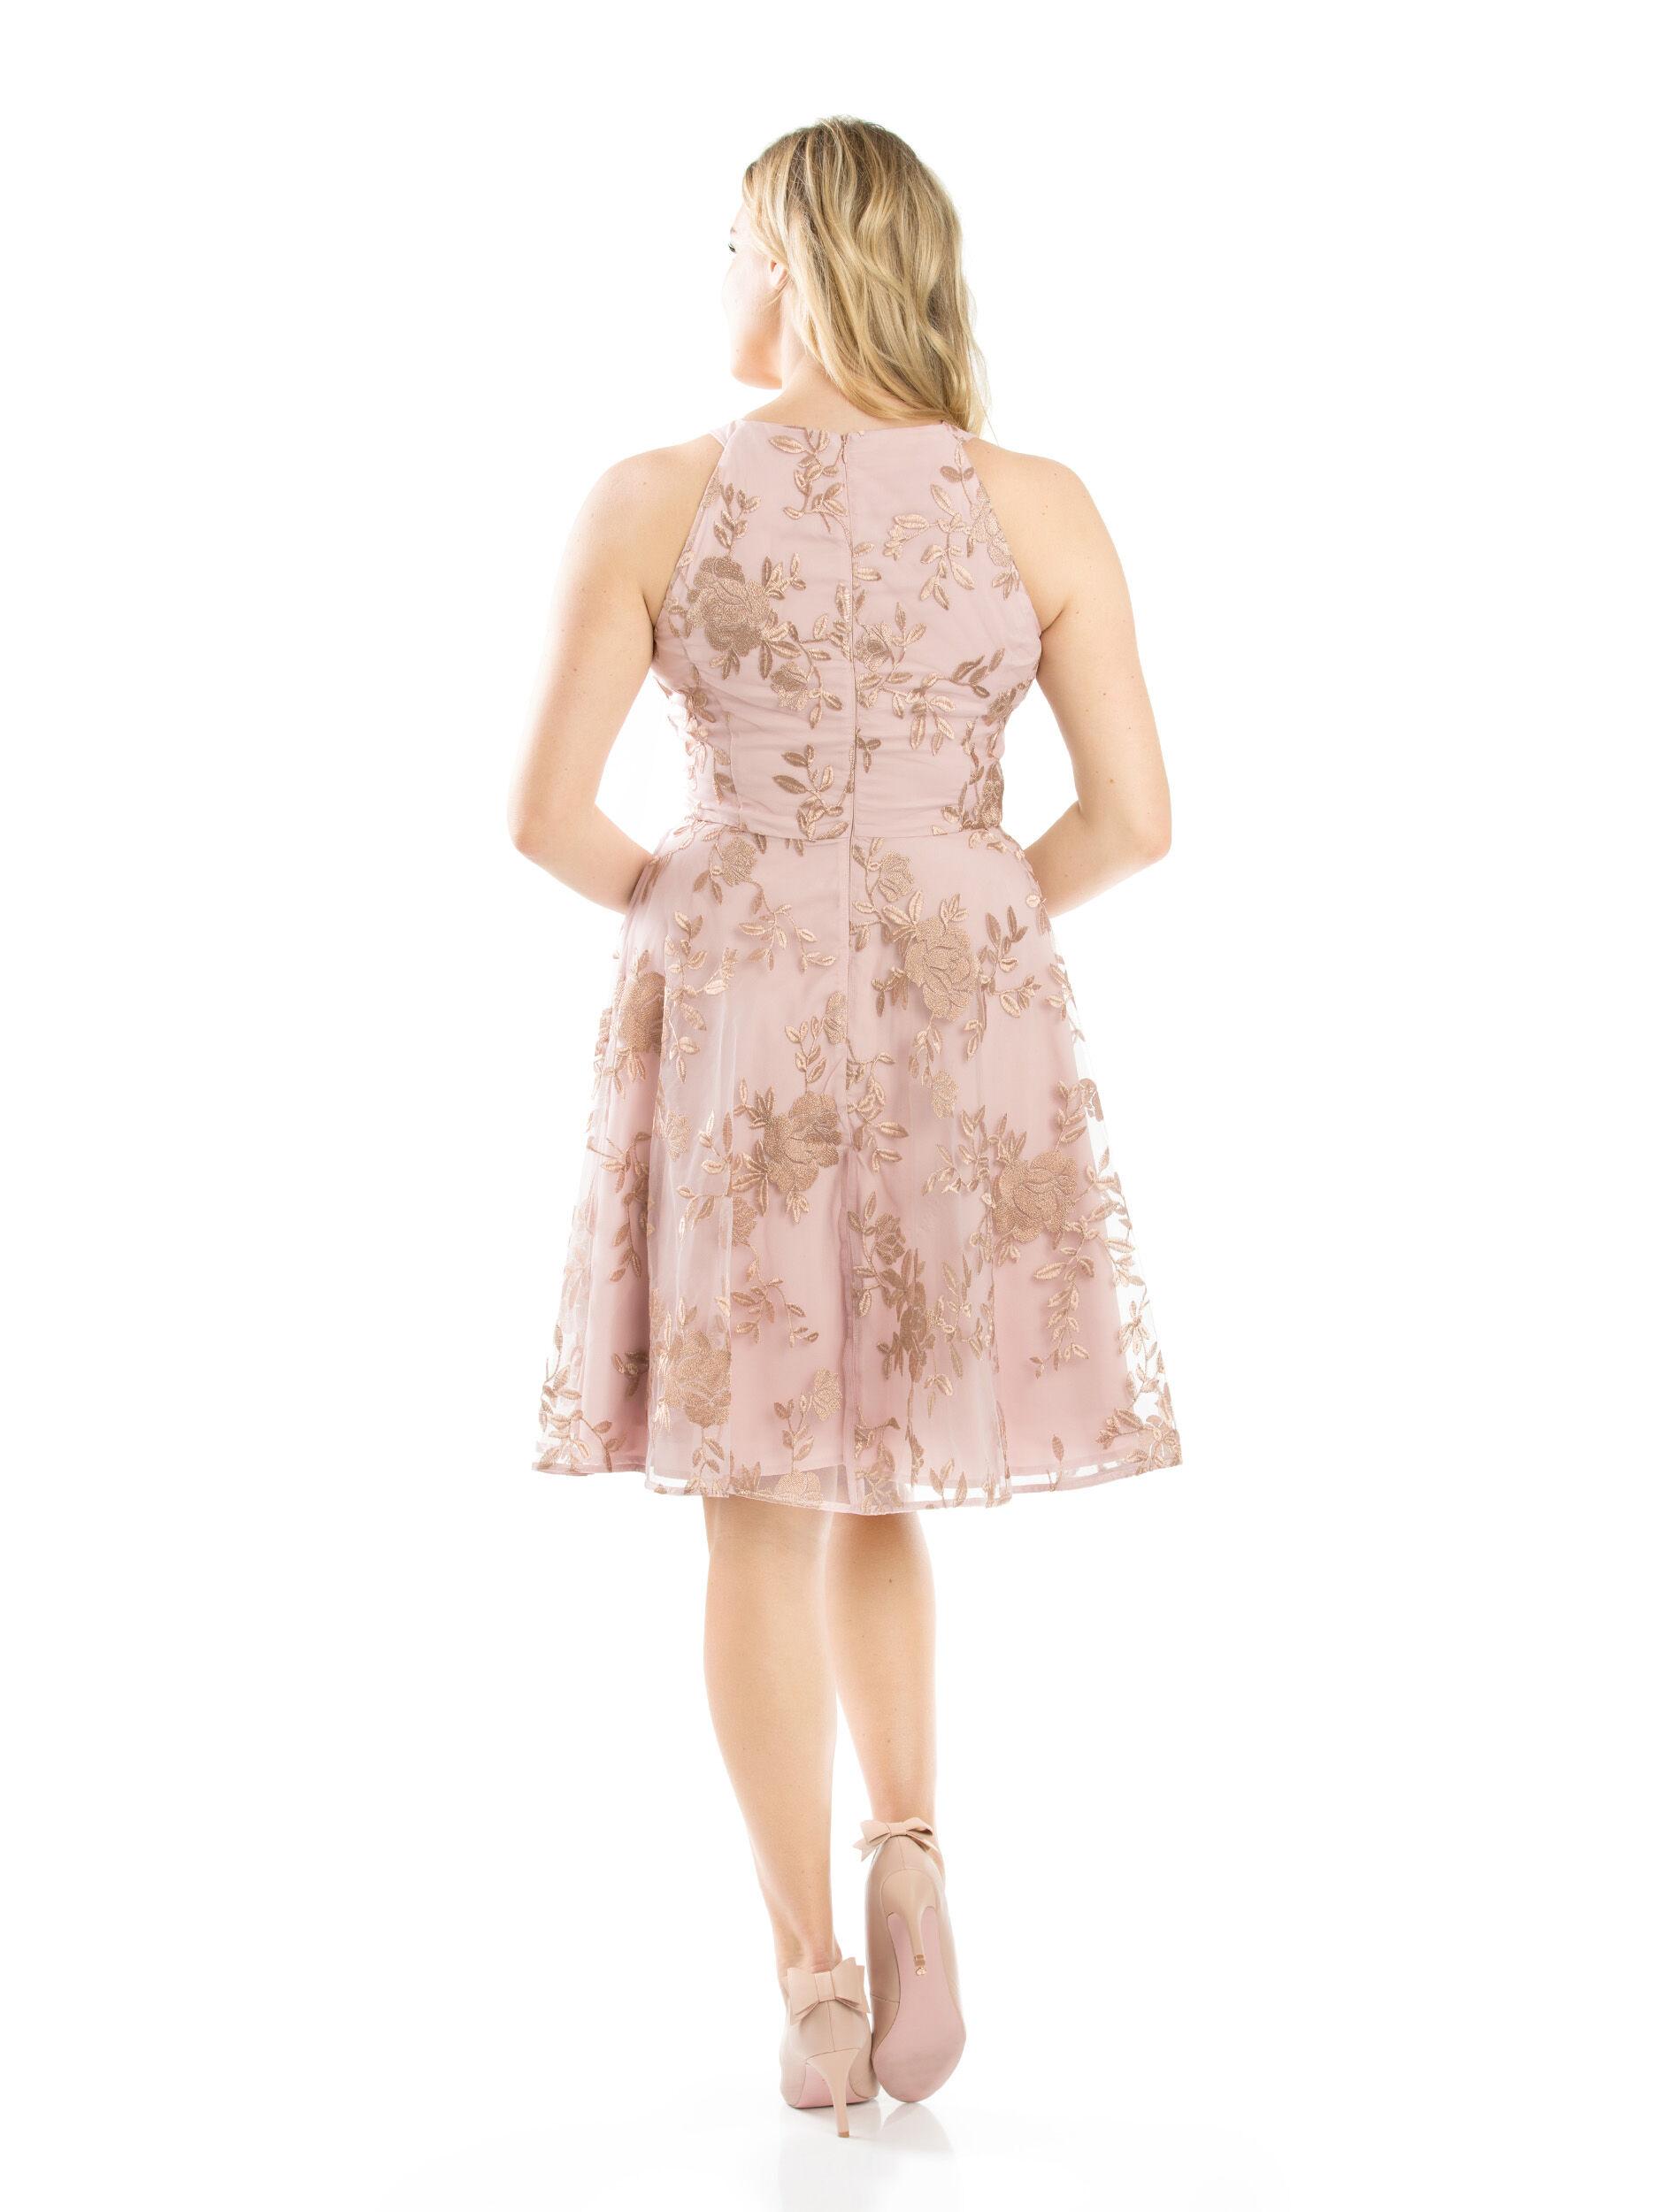 One Night In Venice Dress